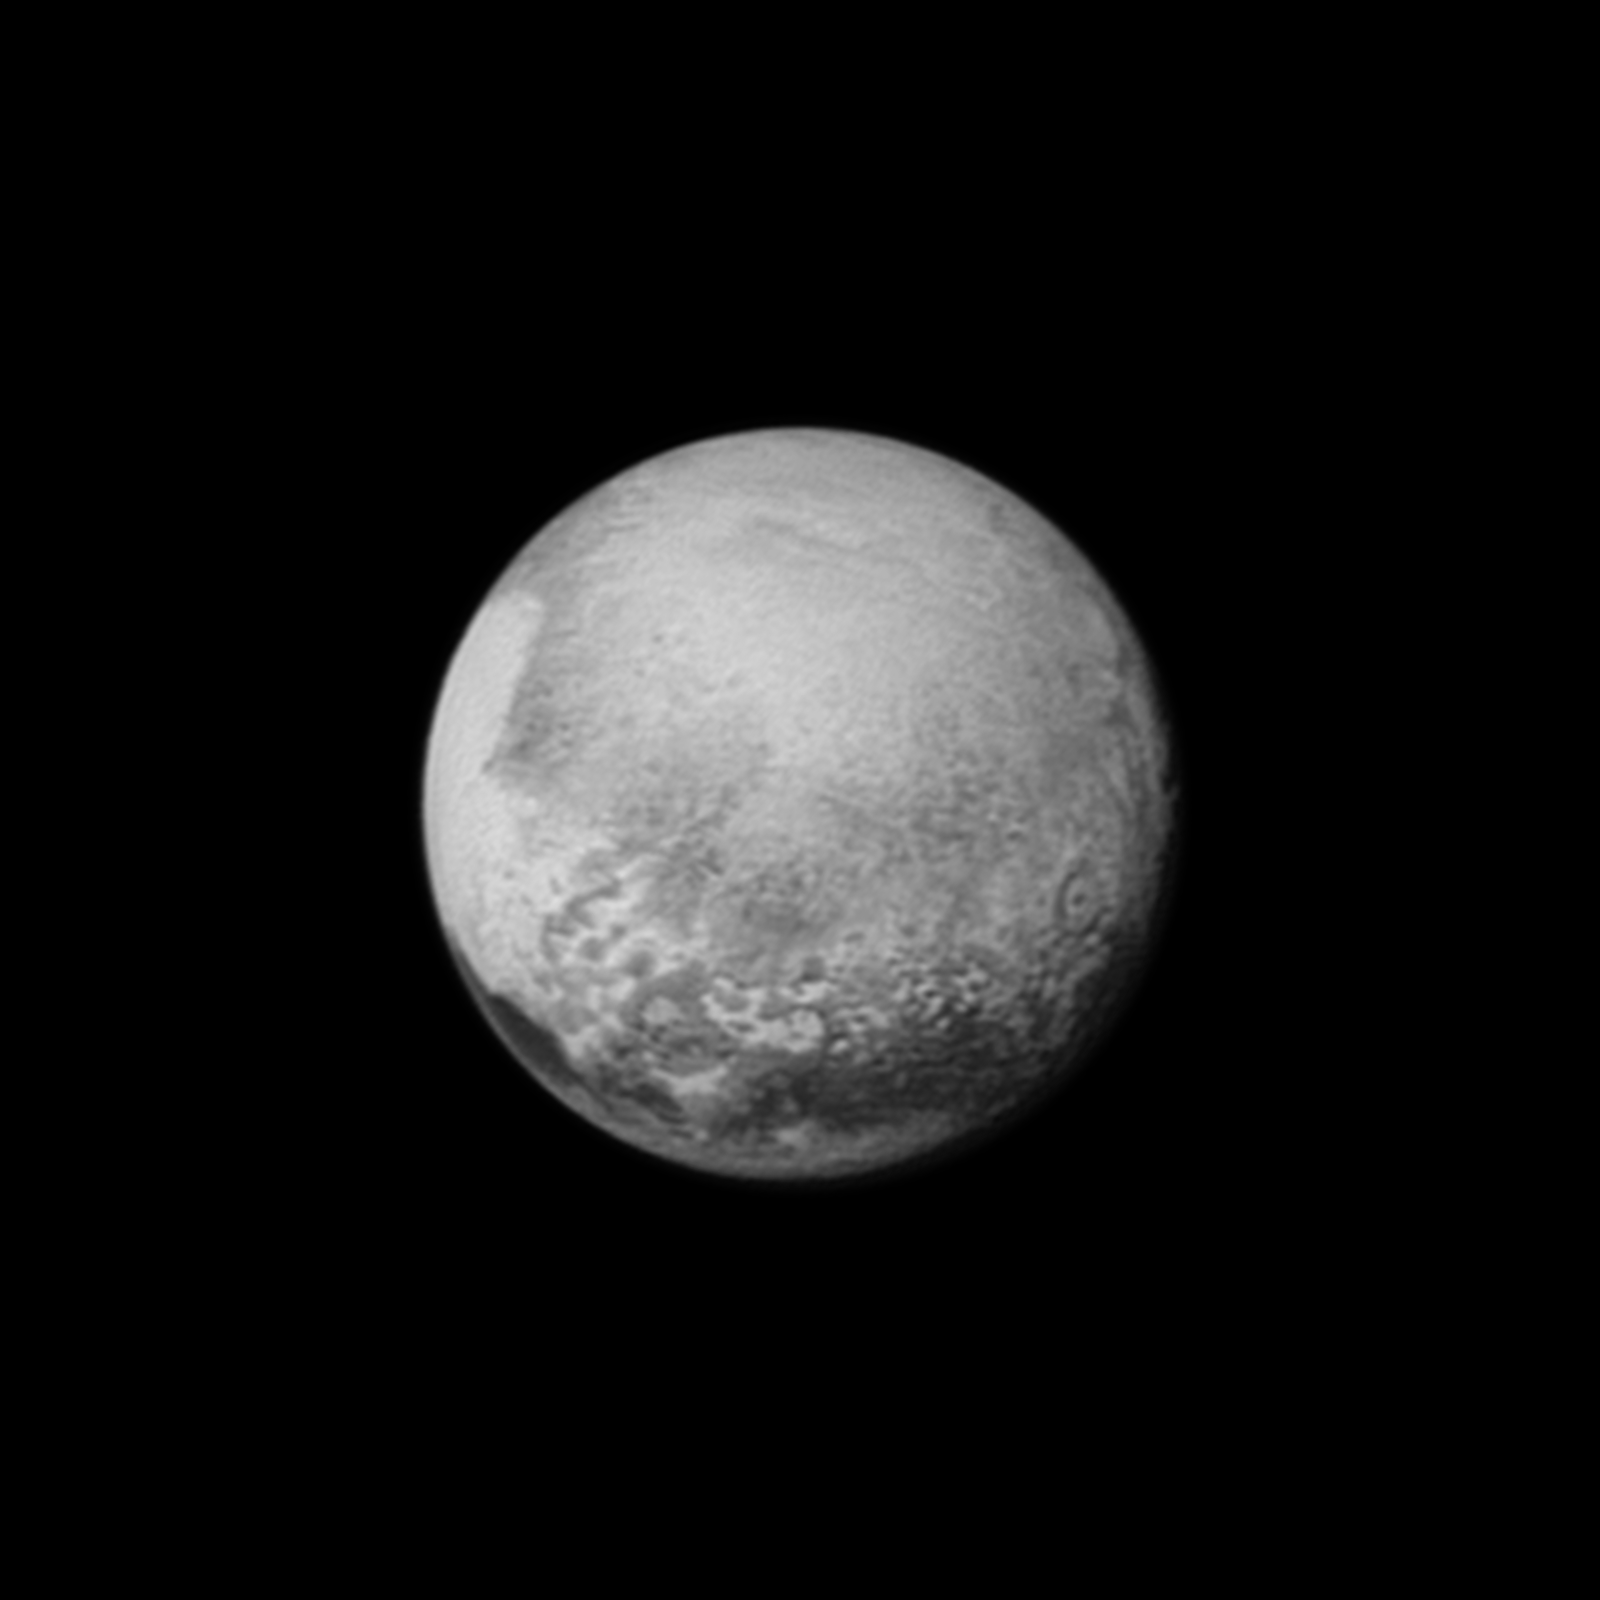 Pluto am 12. Juli 2015